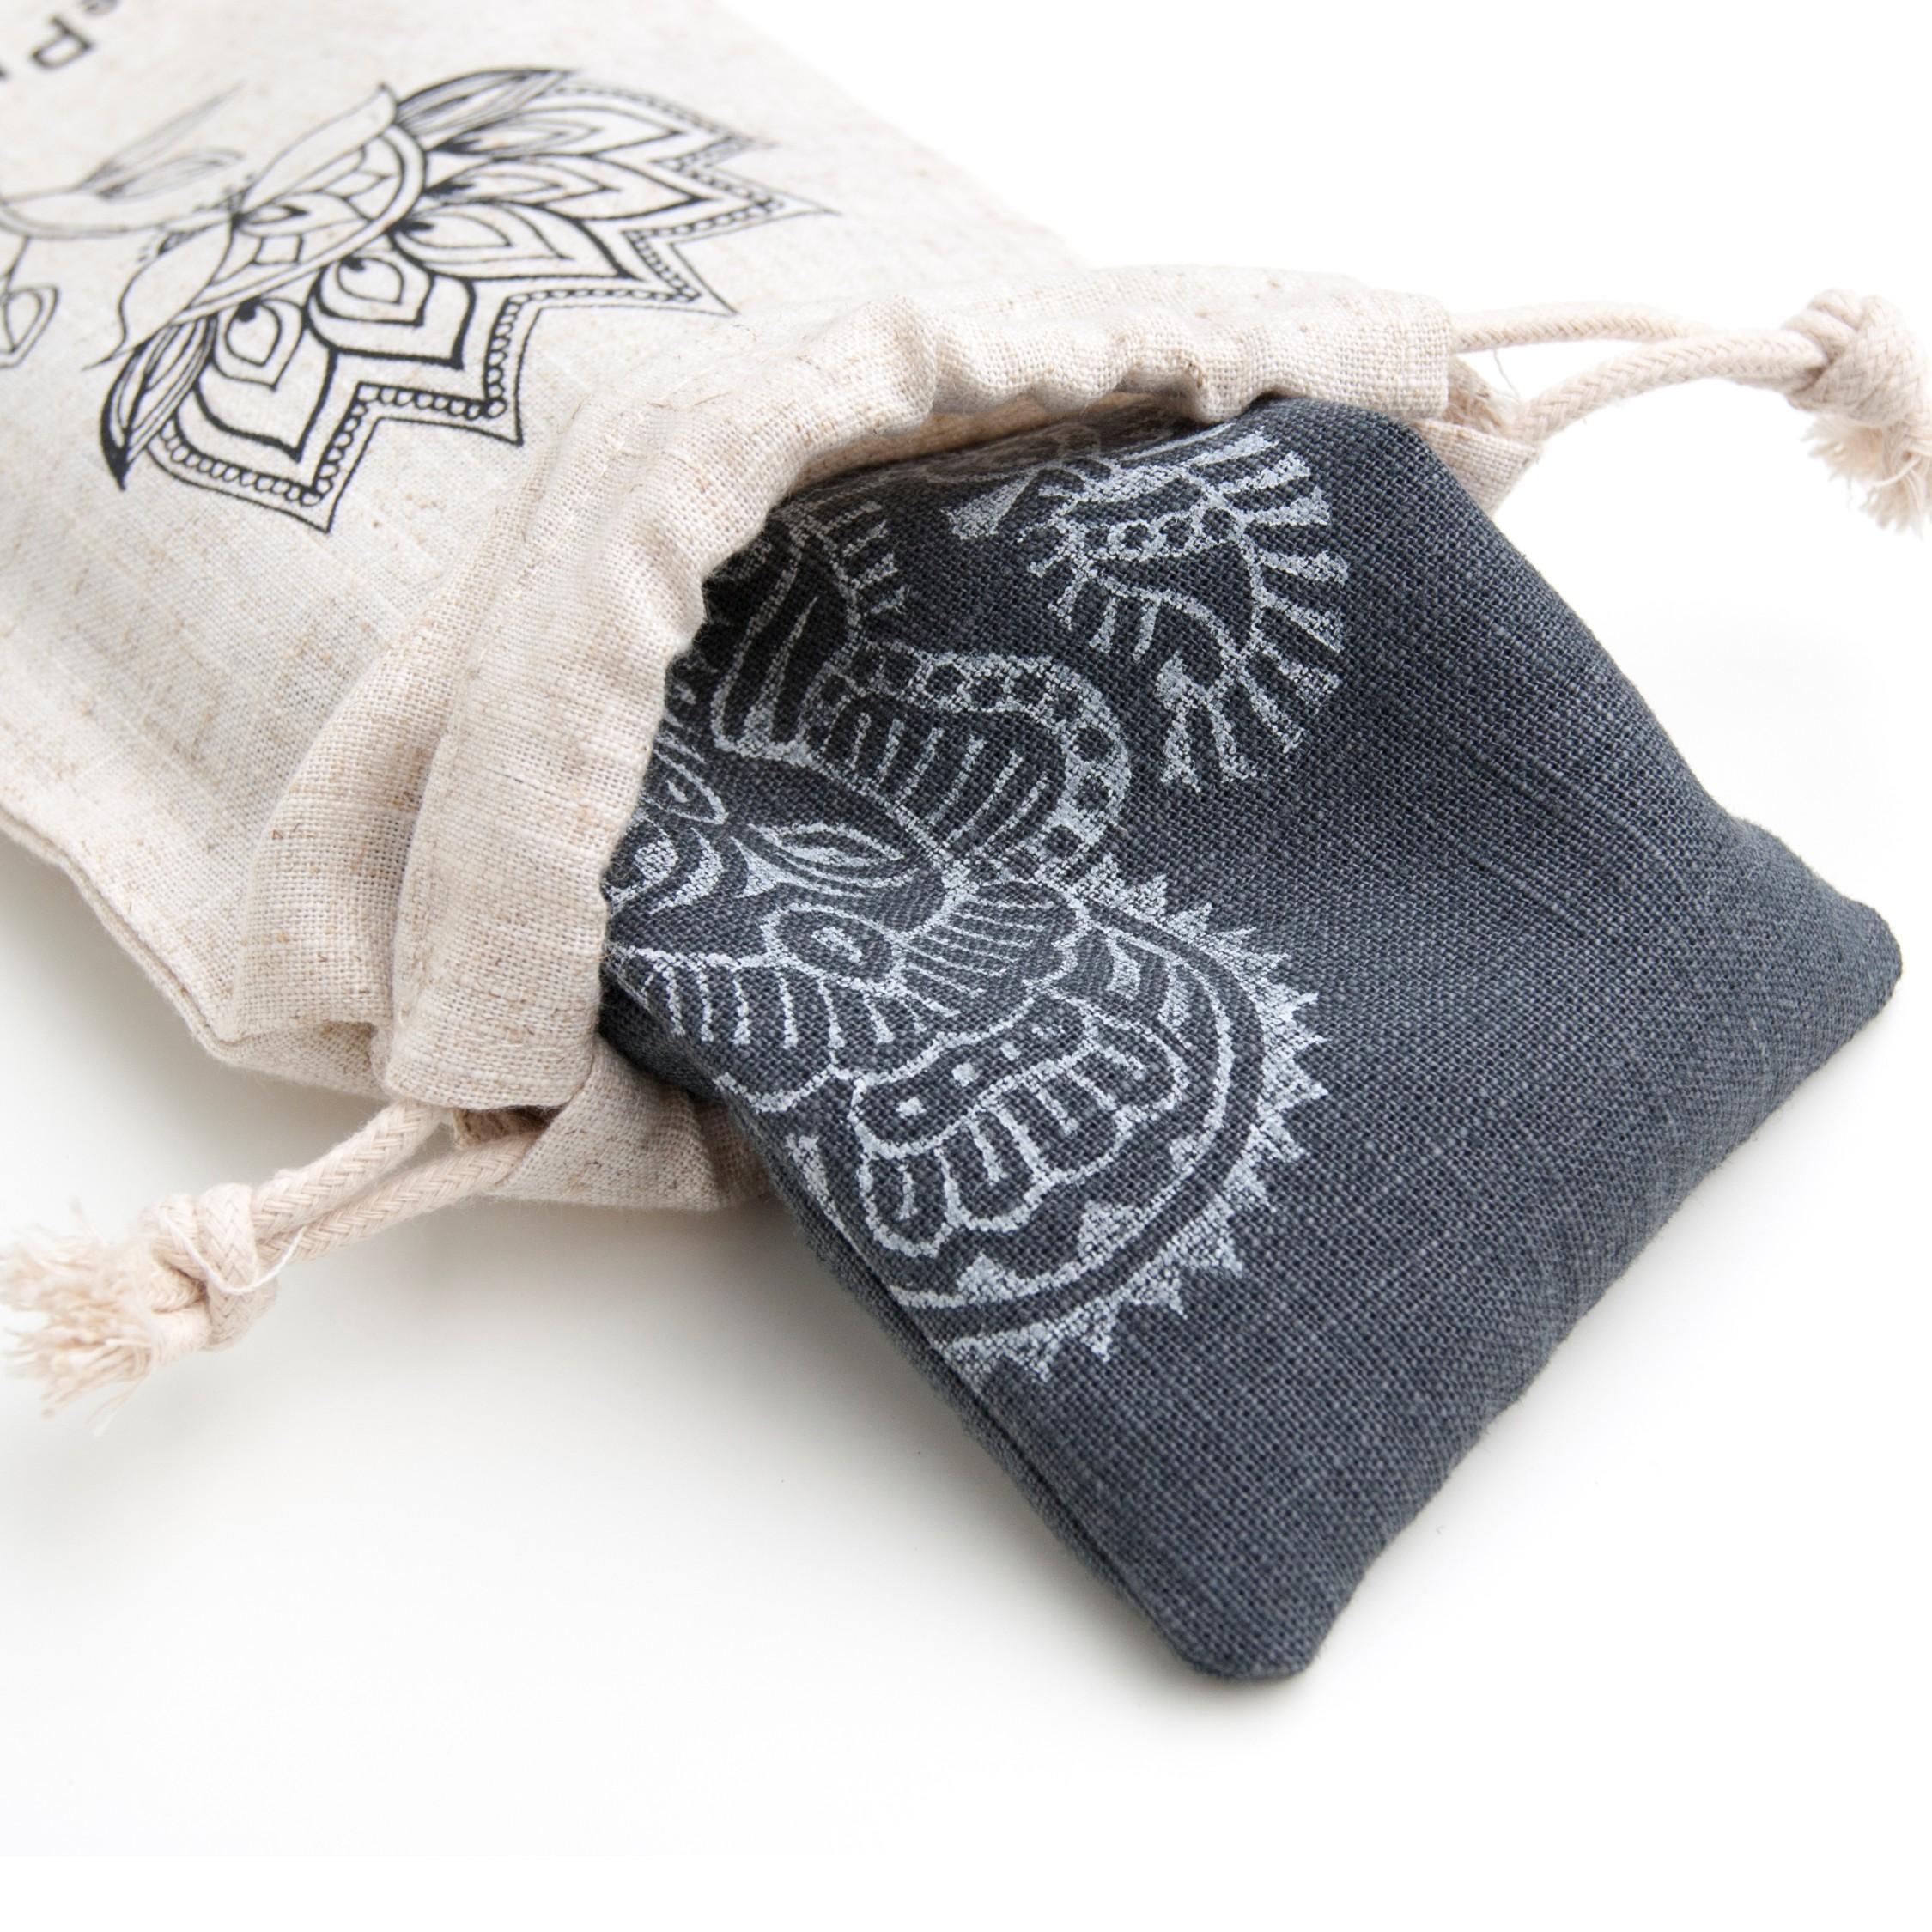 Yoga eye pillow Ganesh